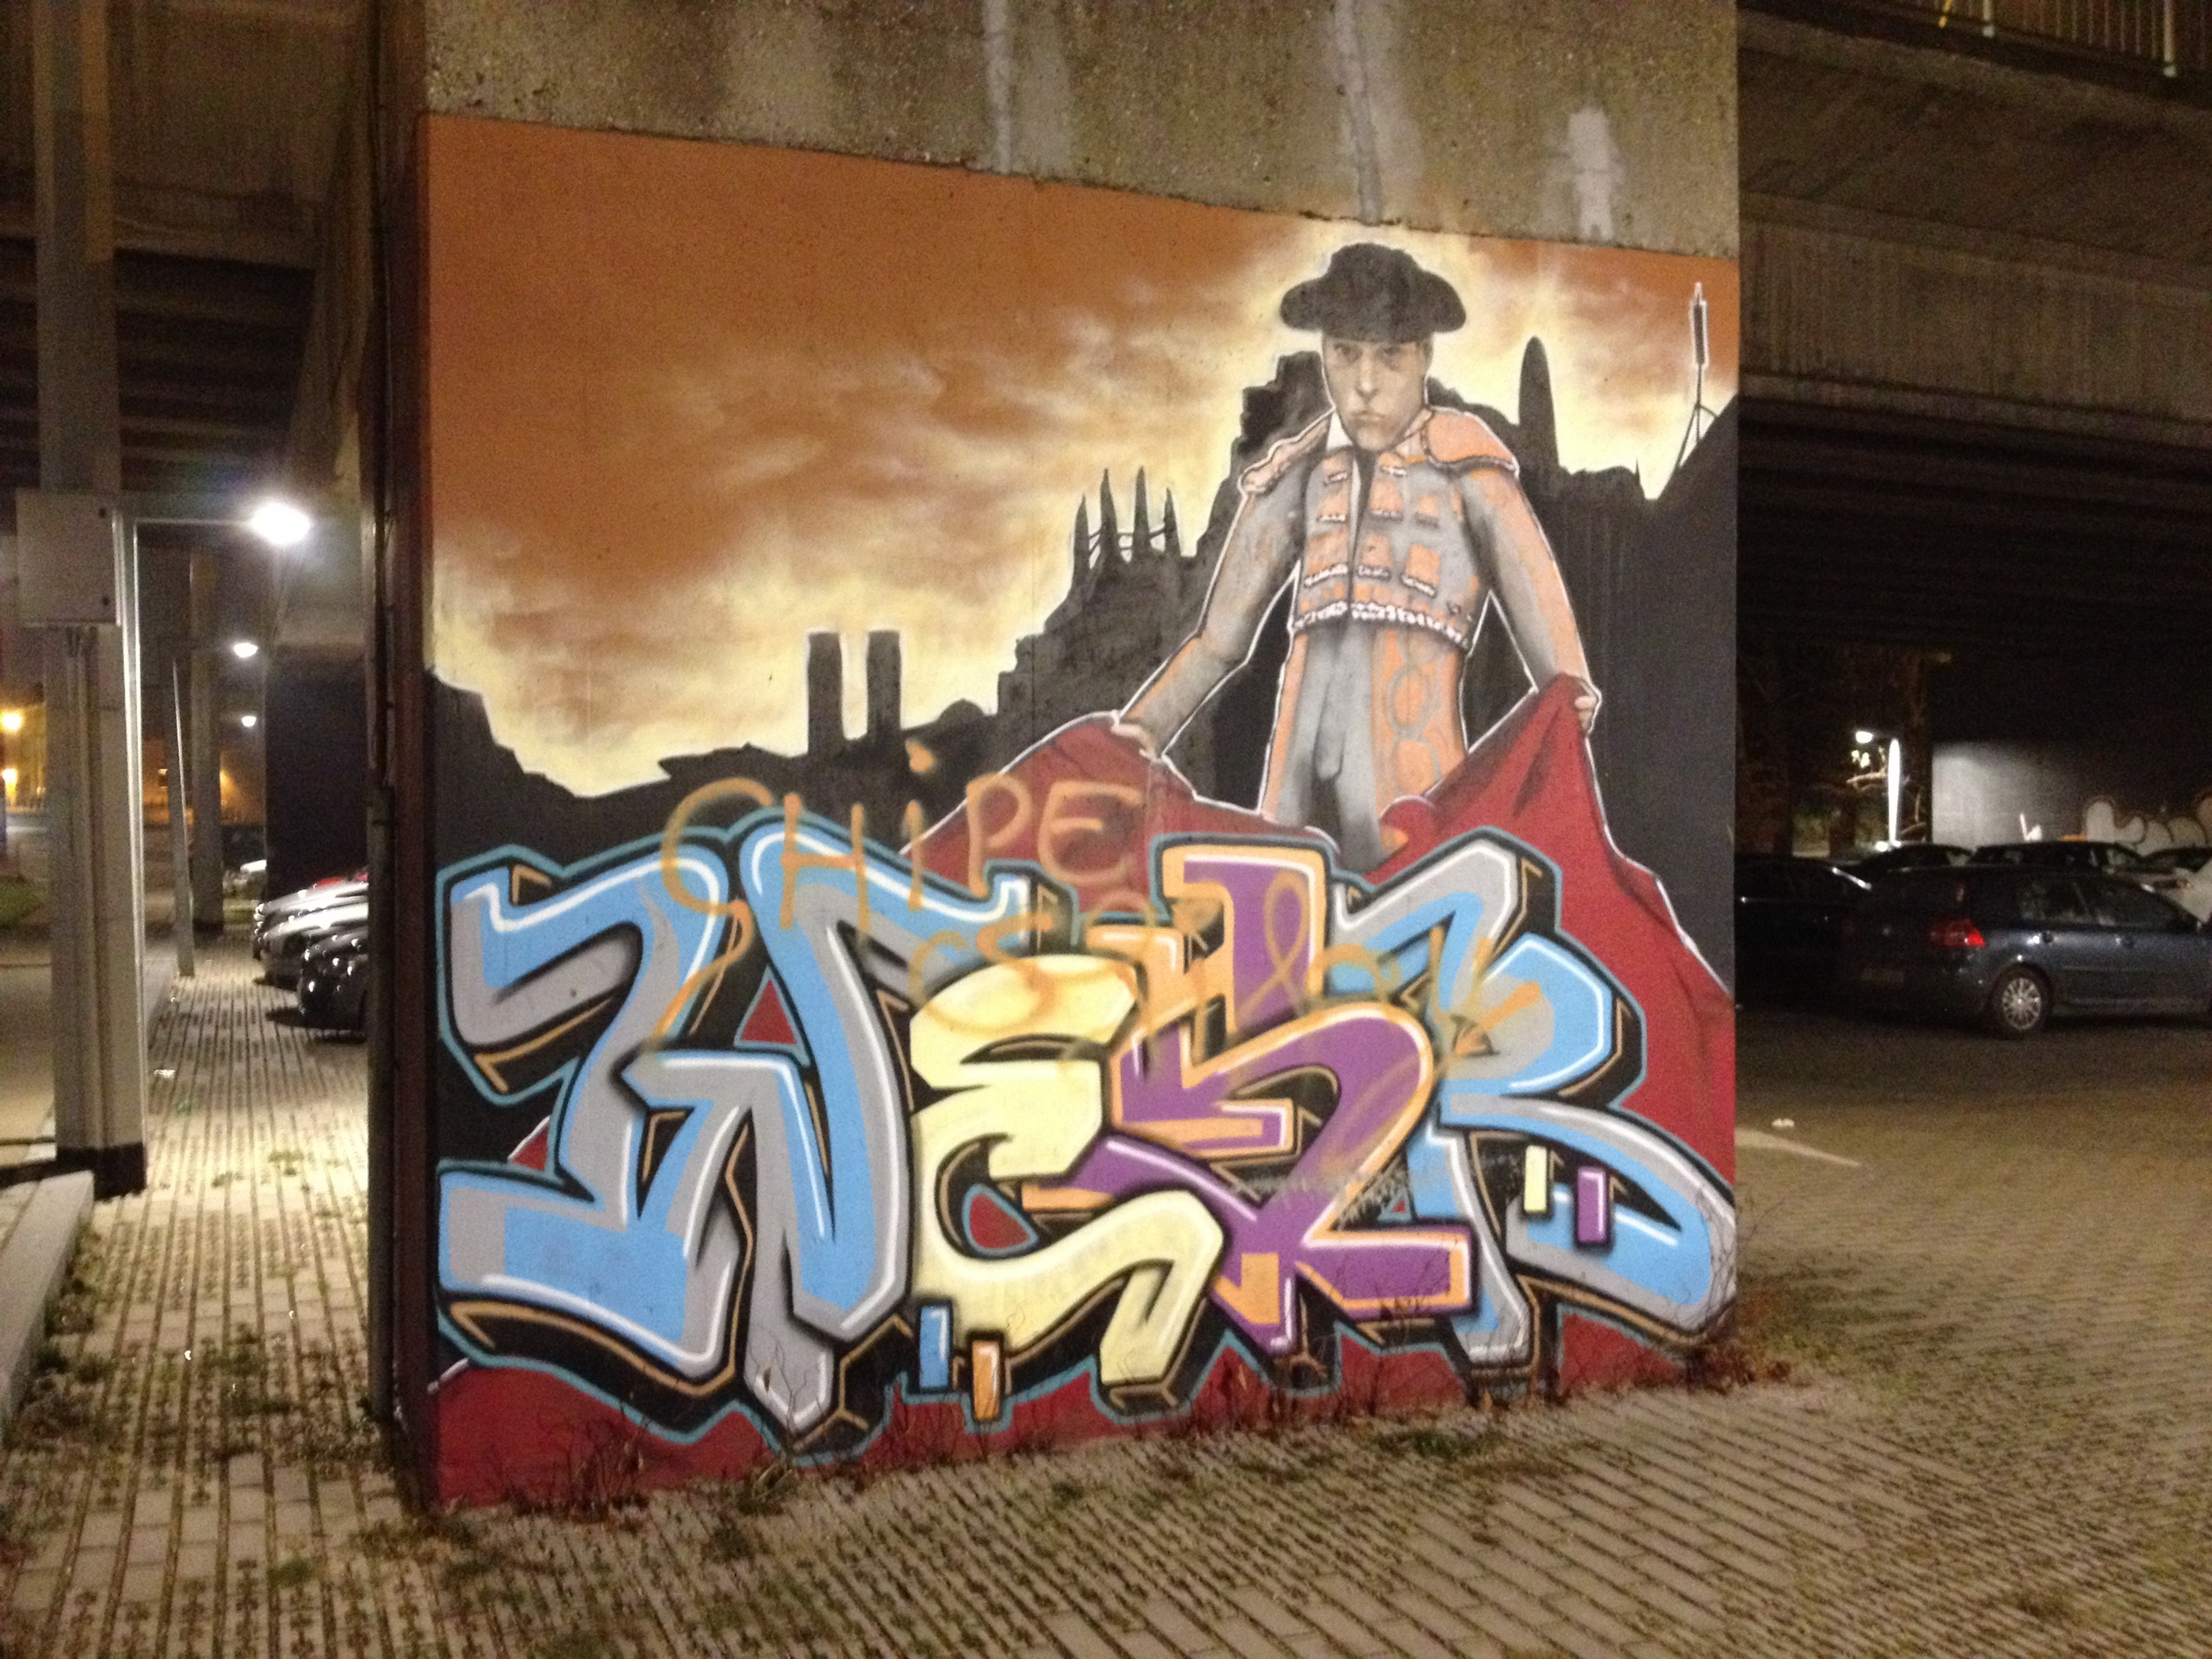 Graffiti in Vilvoorde (photo by Paul Forrester)